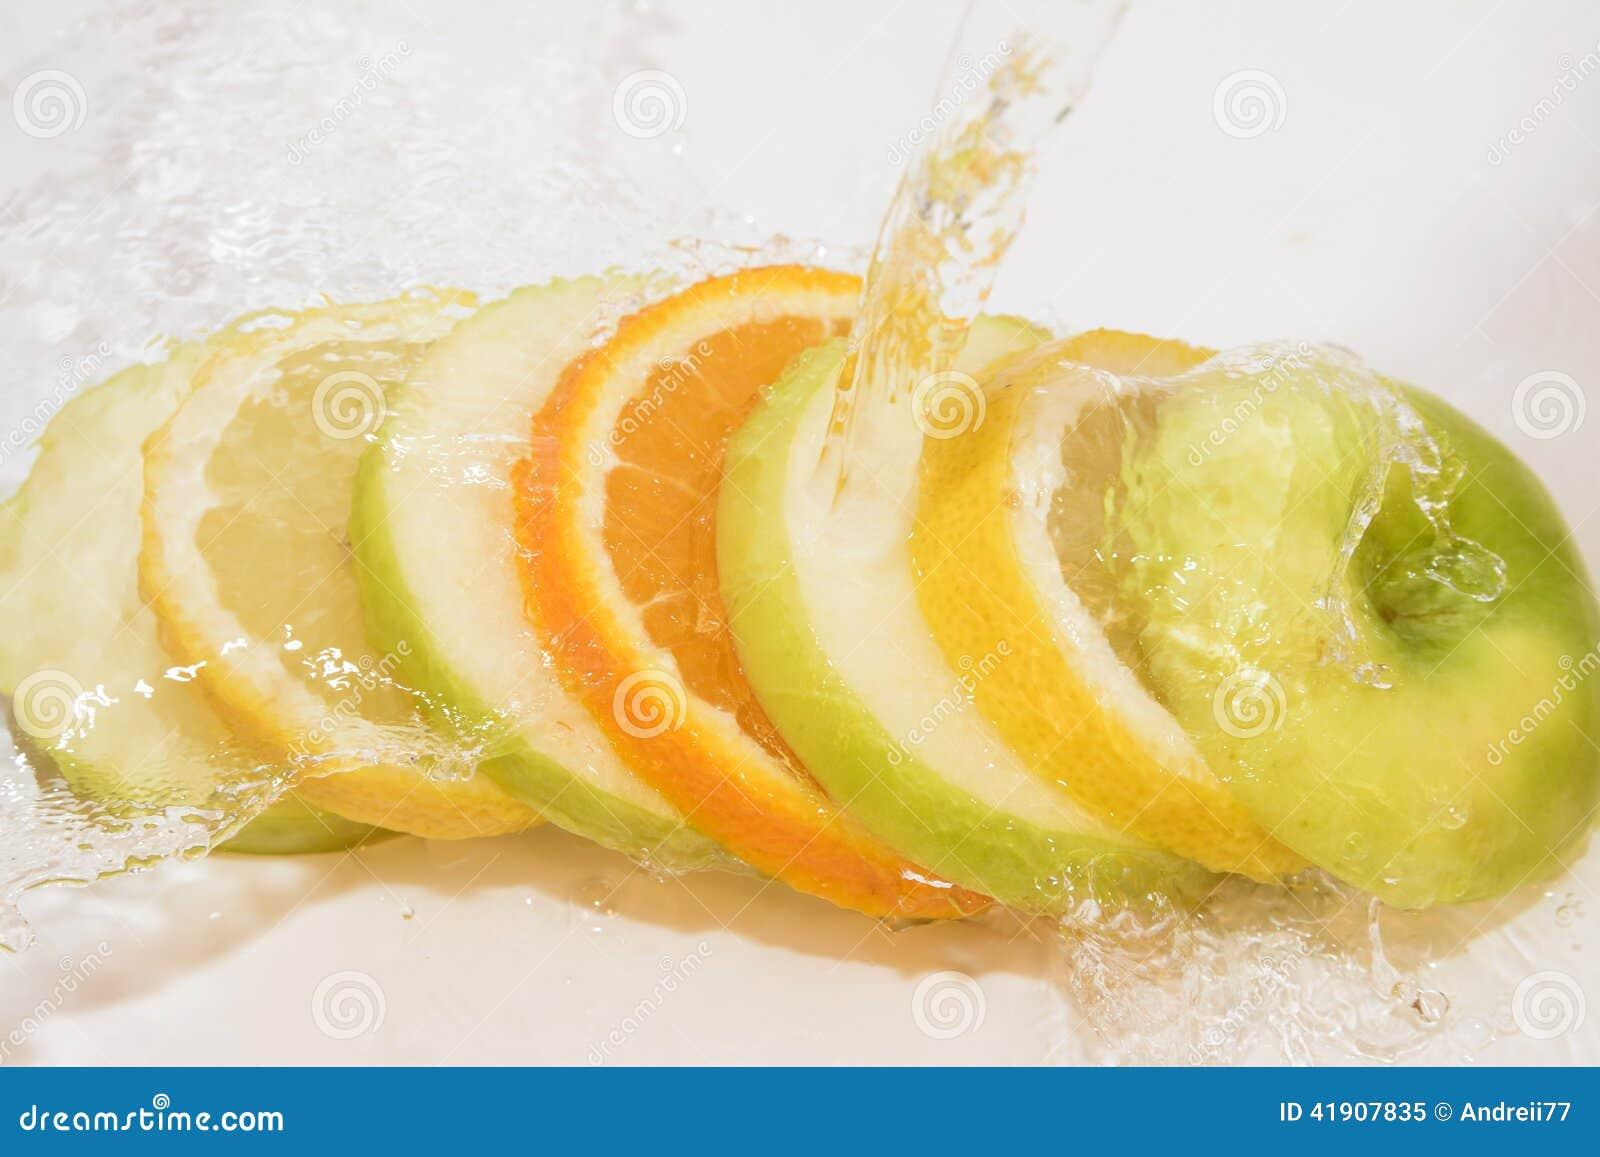 Apple lemon oranges